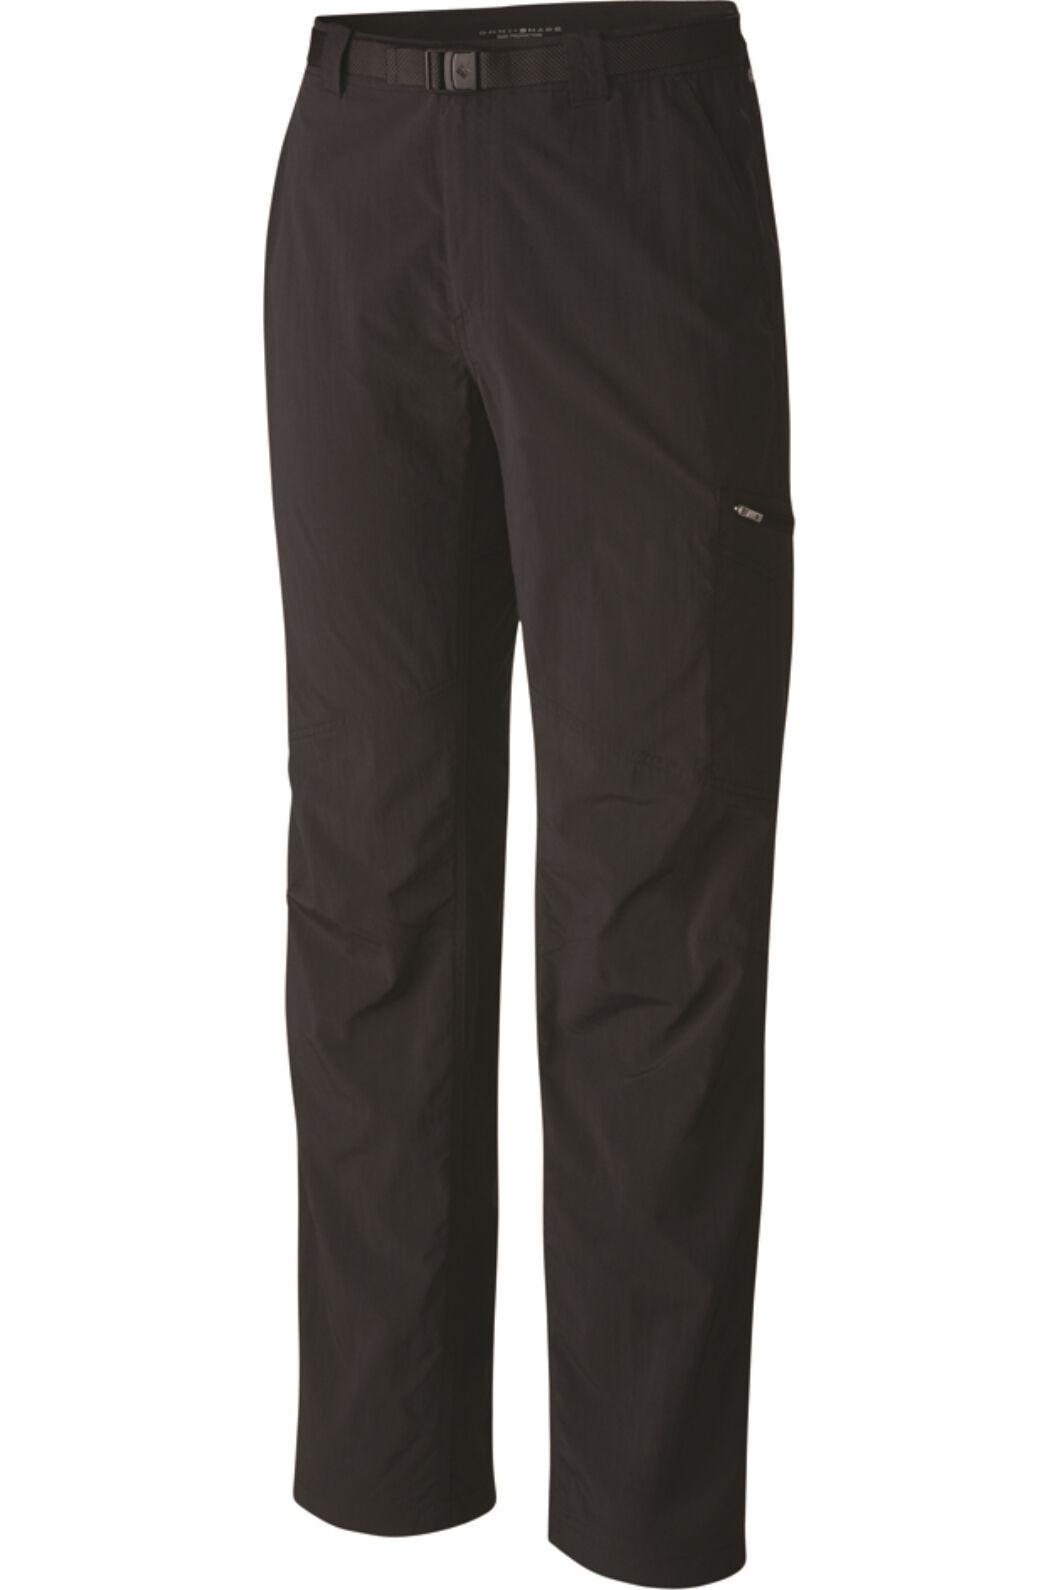 Columbia Men's  Ridge Cargo Pant, Black, hi-res